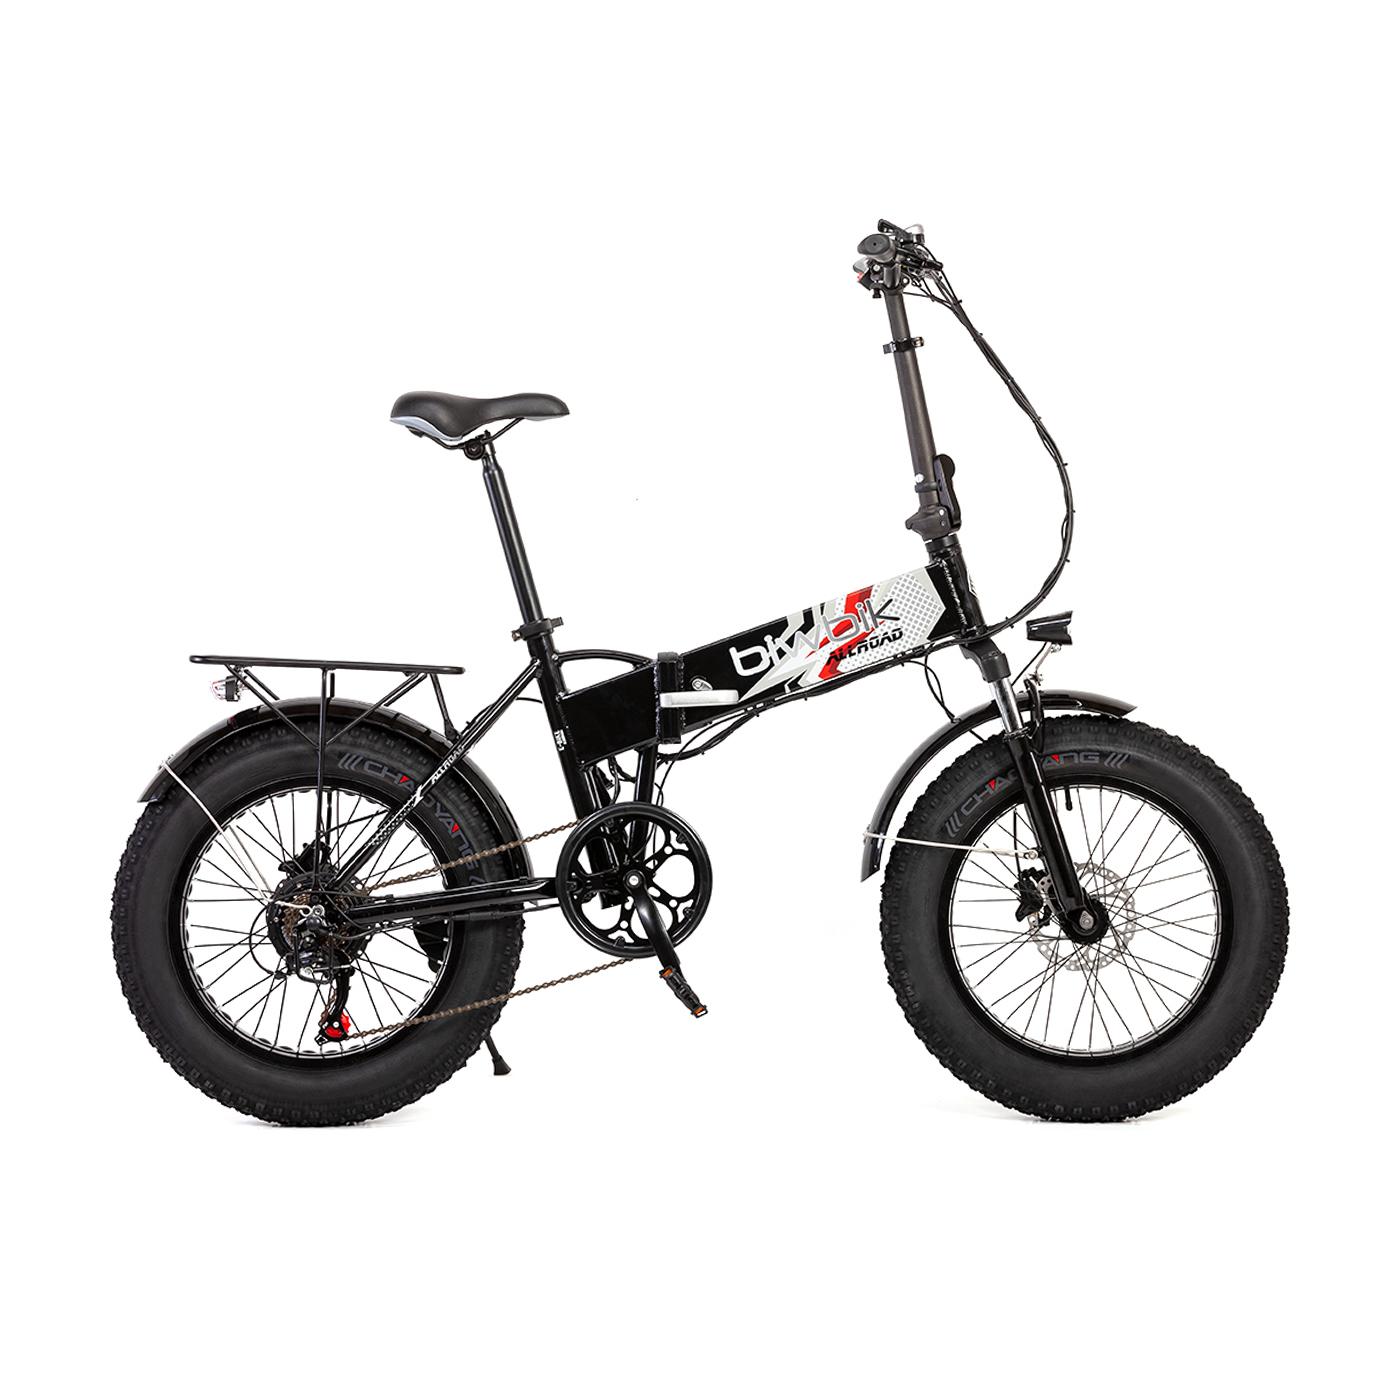 Bicicleta eléctrica plegable Traveller all road white